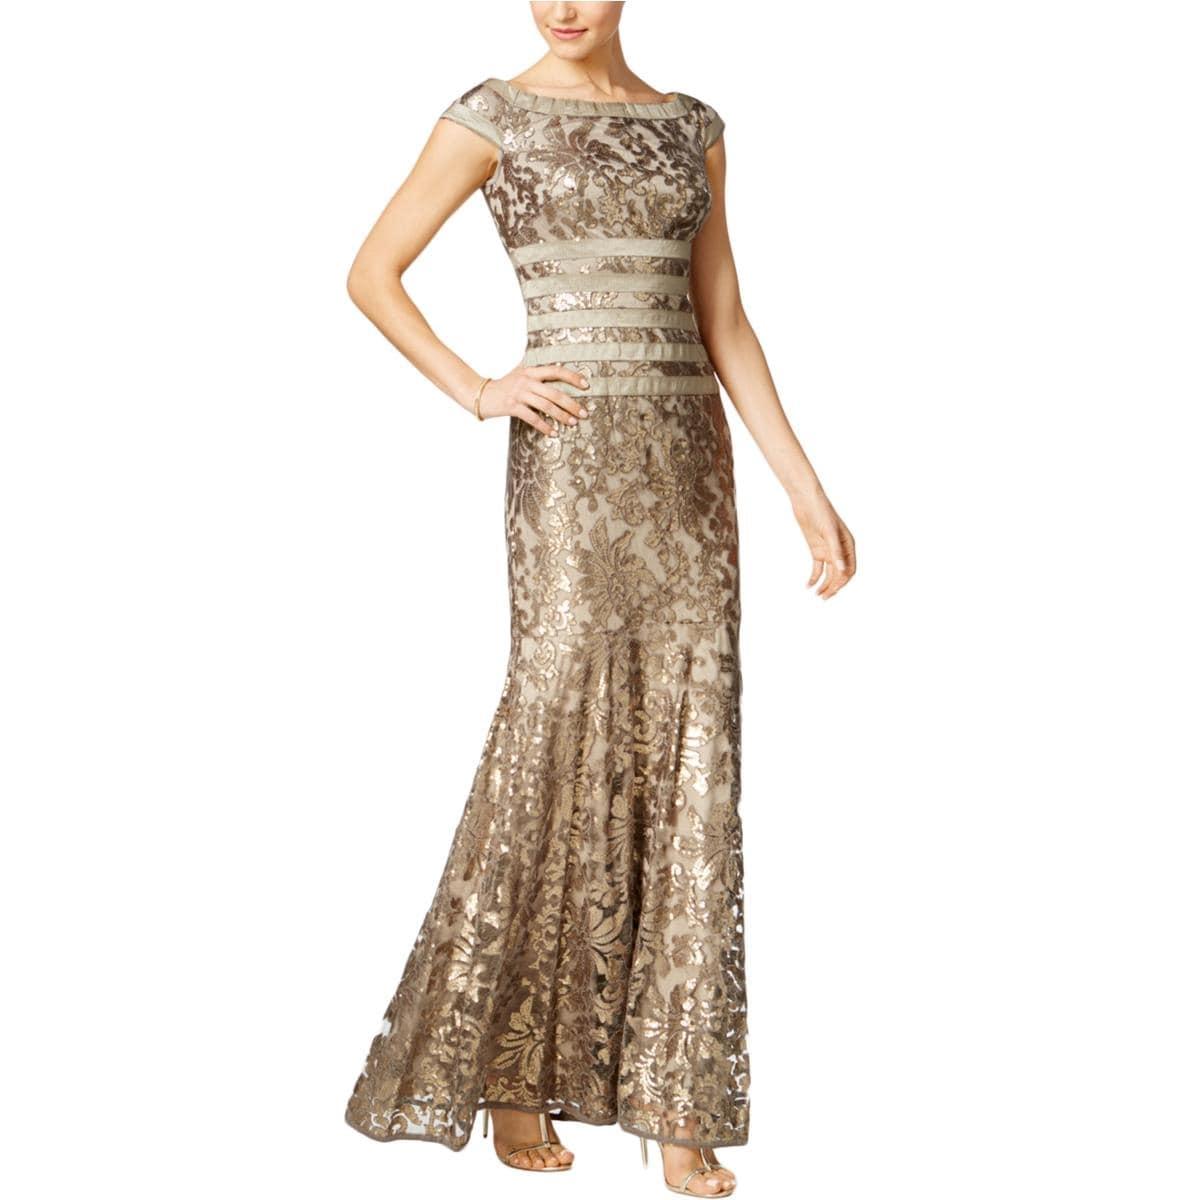 Shop Tadashi Shoji Womens Evening Dress Metallic Sequined - Free ...